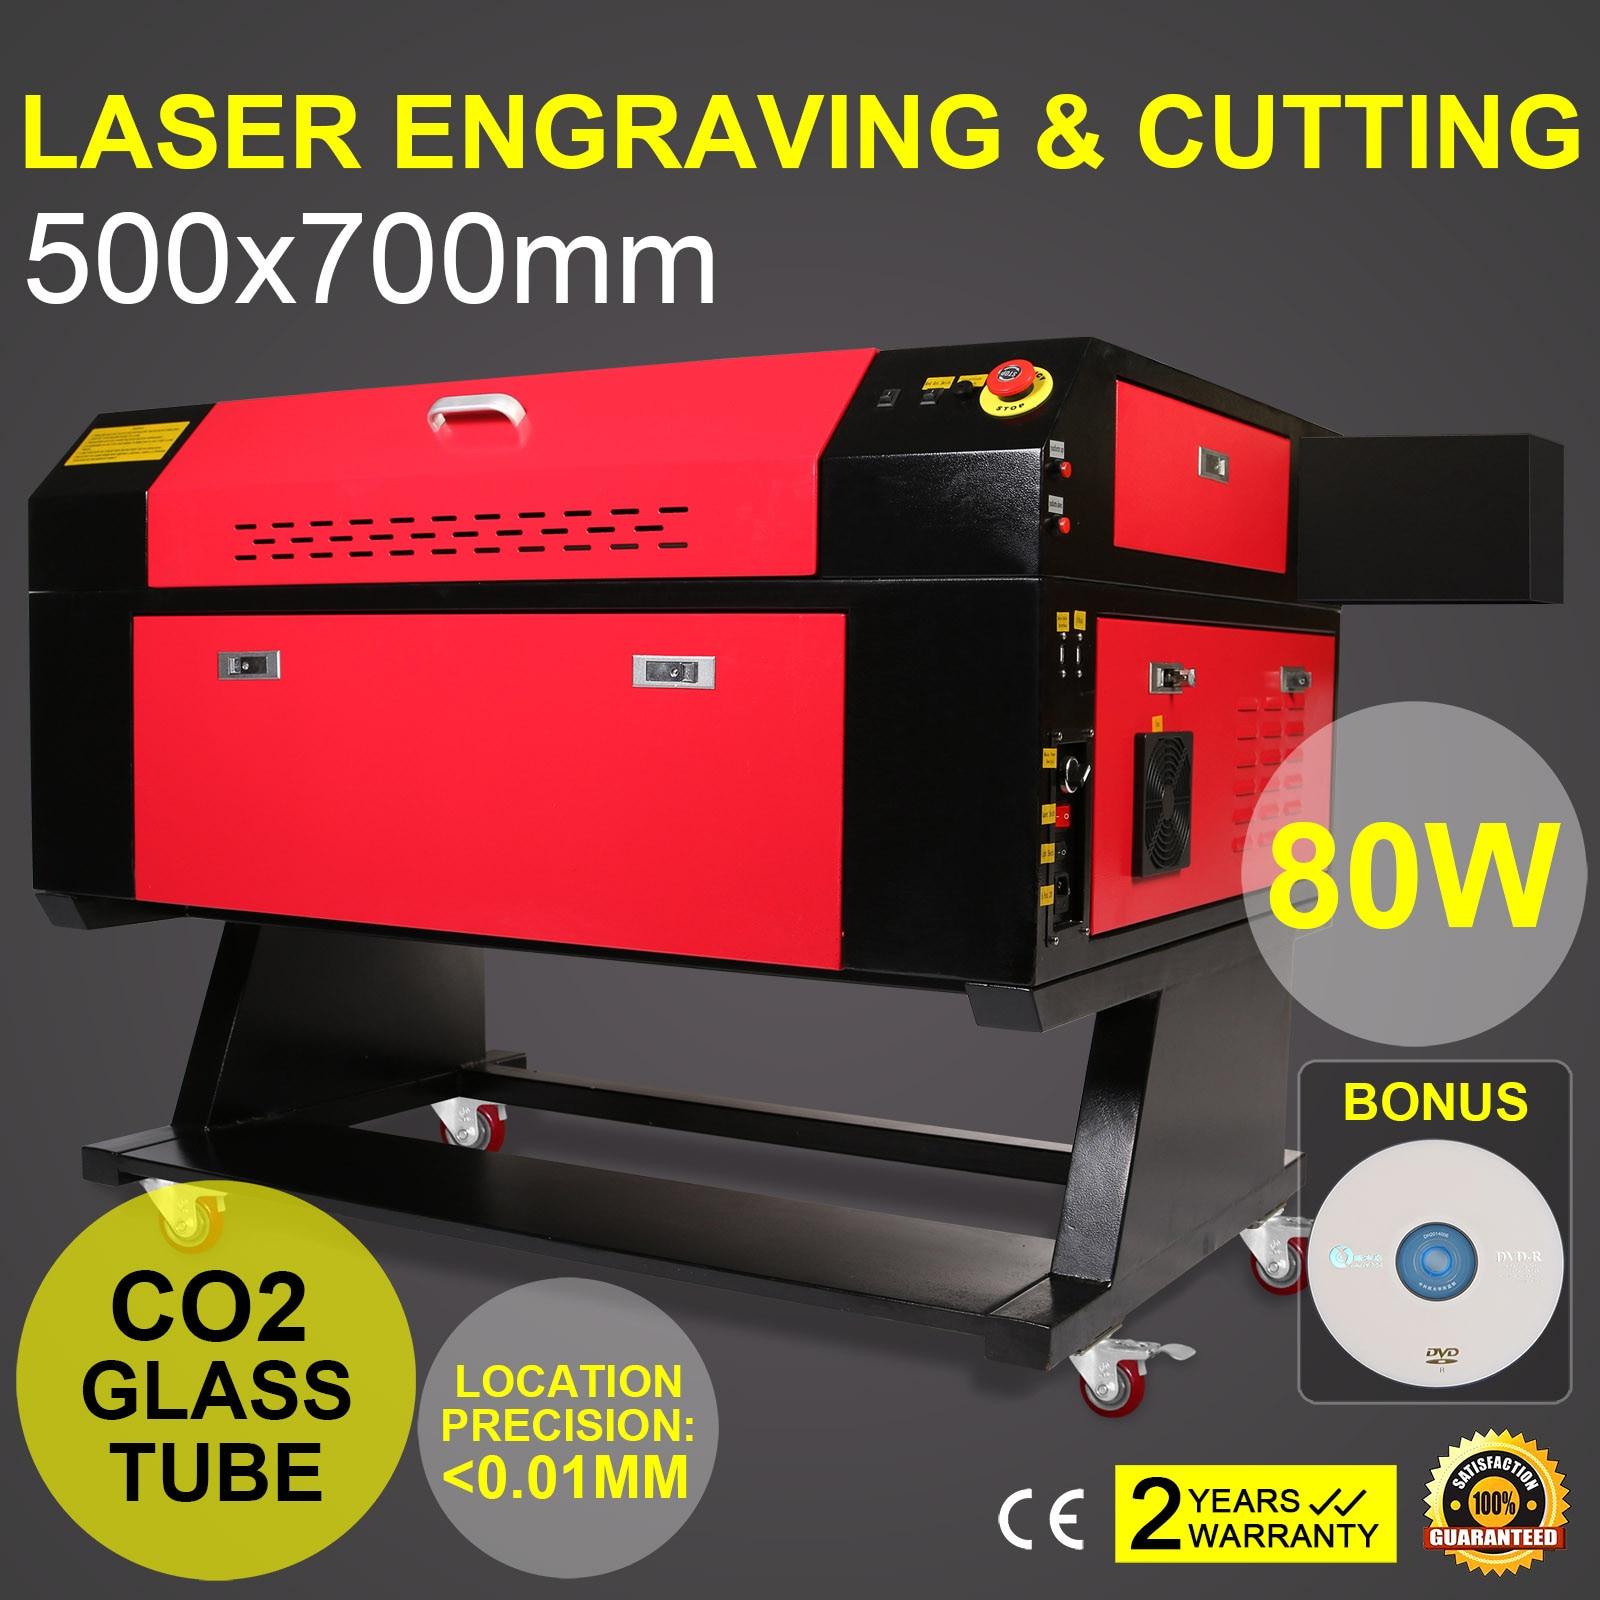 Mini Co2 Laser Engraving Machine Multiple Usage 7050 Engraver Machine DSP Control System